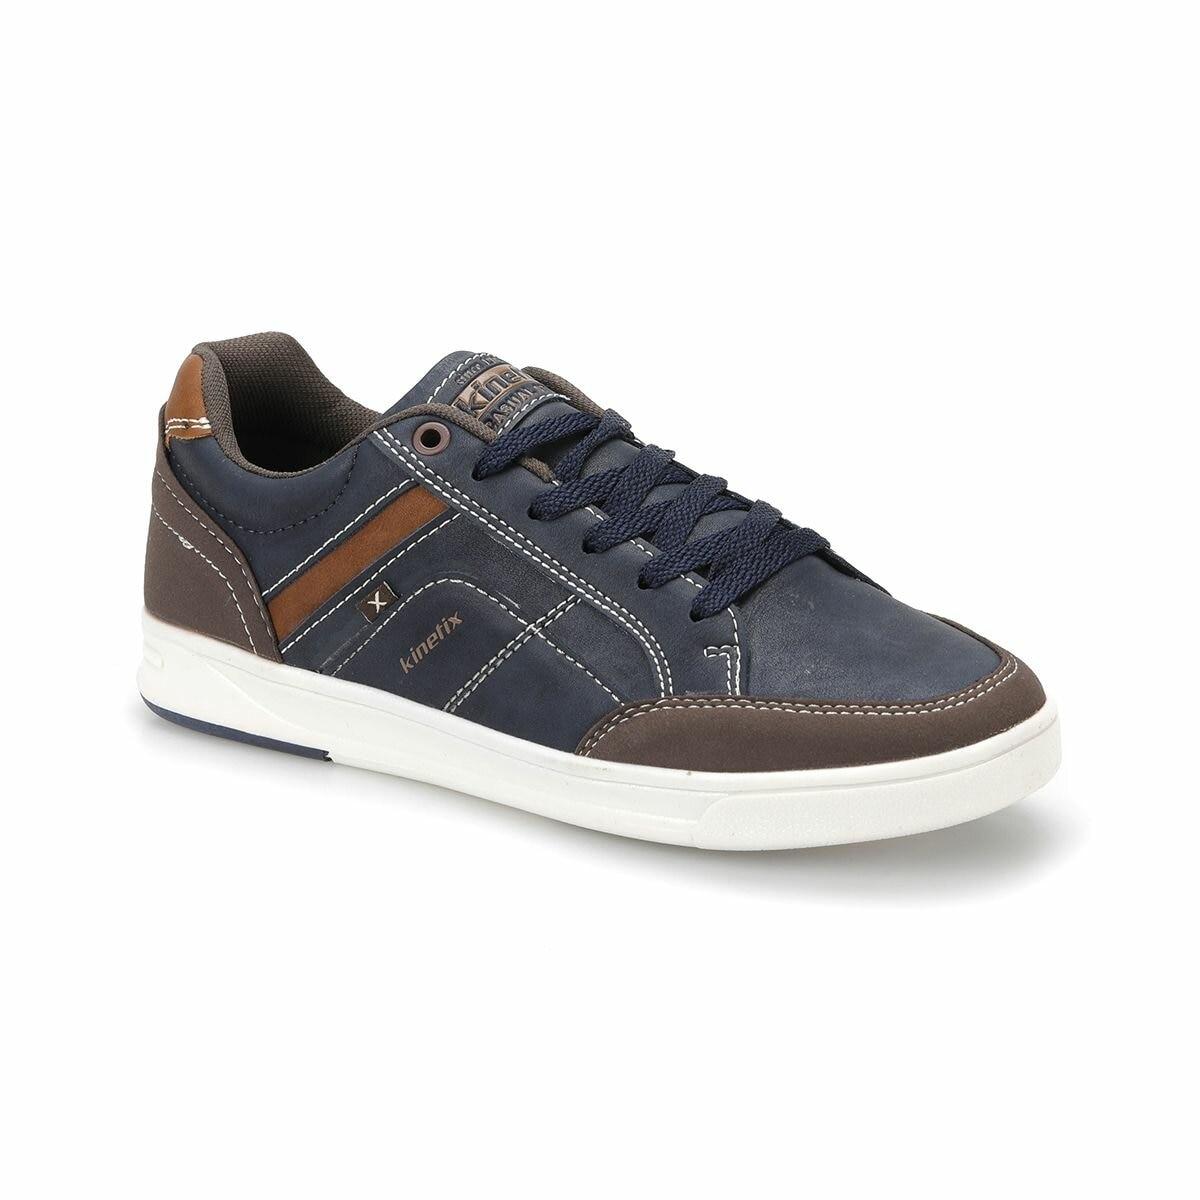 FLO ANDREAS Navy Blue Men Casual Shoes KINETIX